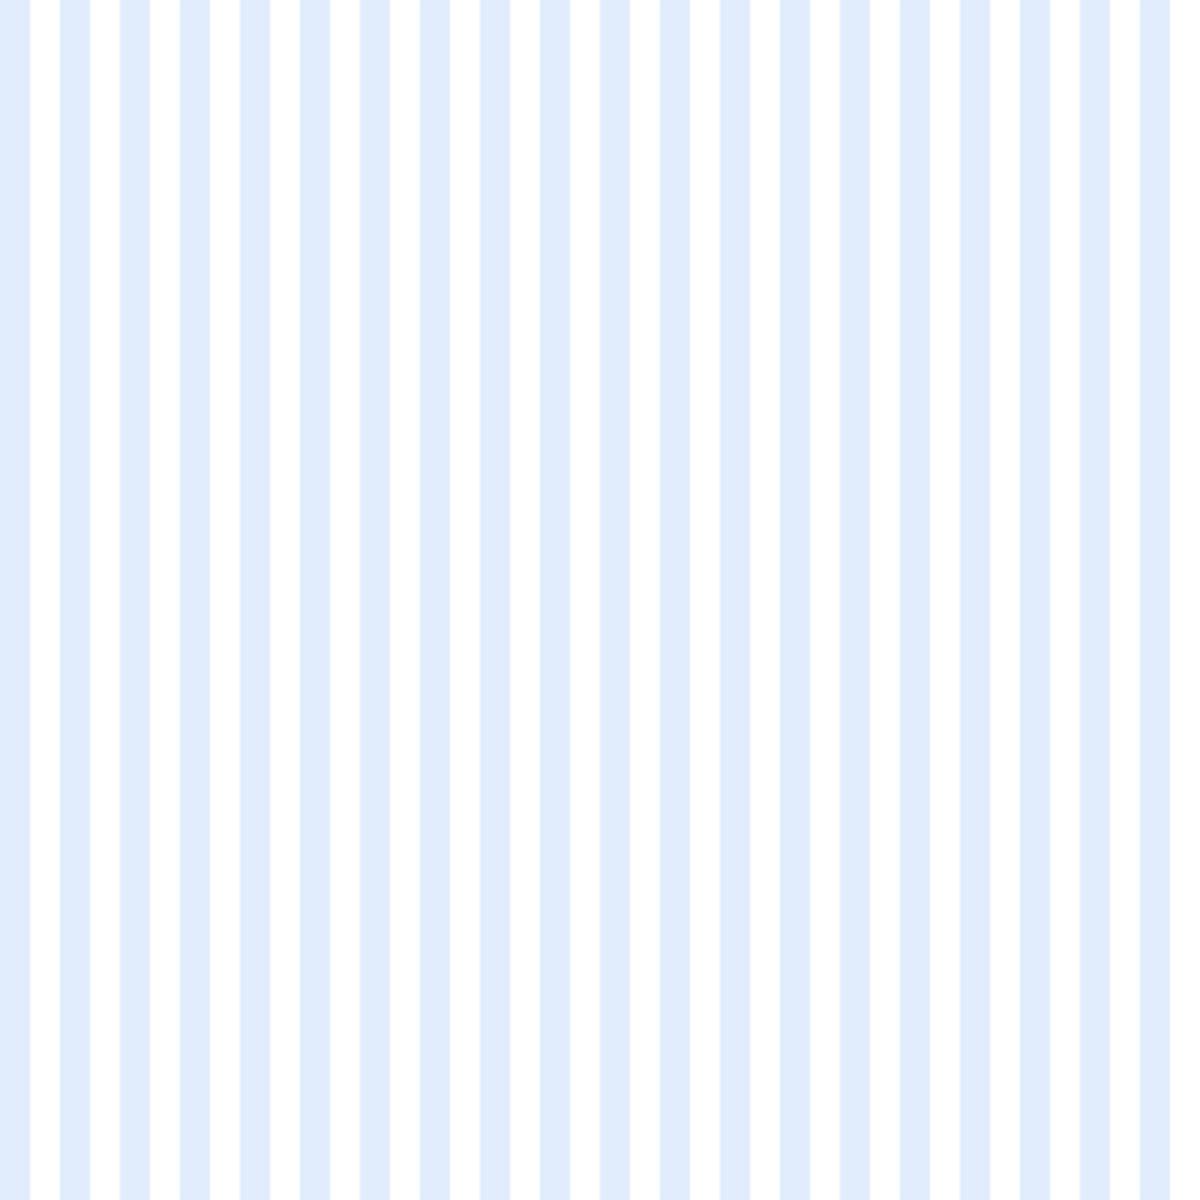 Baby Blue Stripes Wallpaper - WallpaperSafari